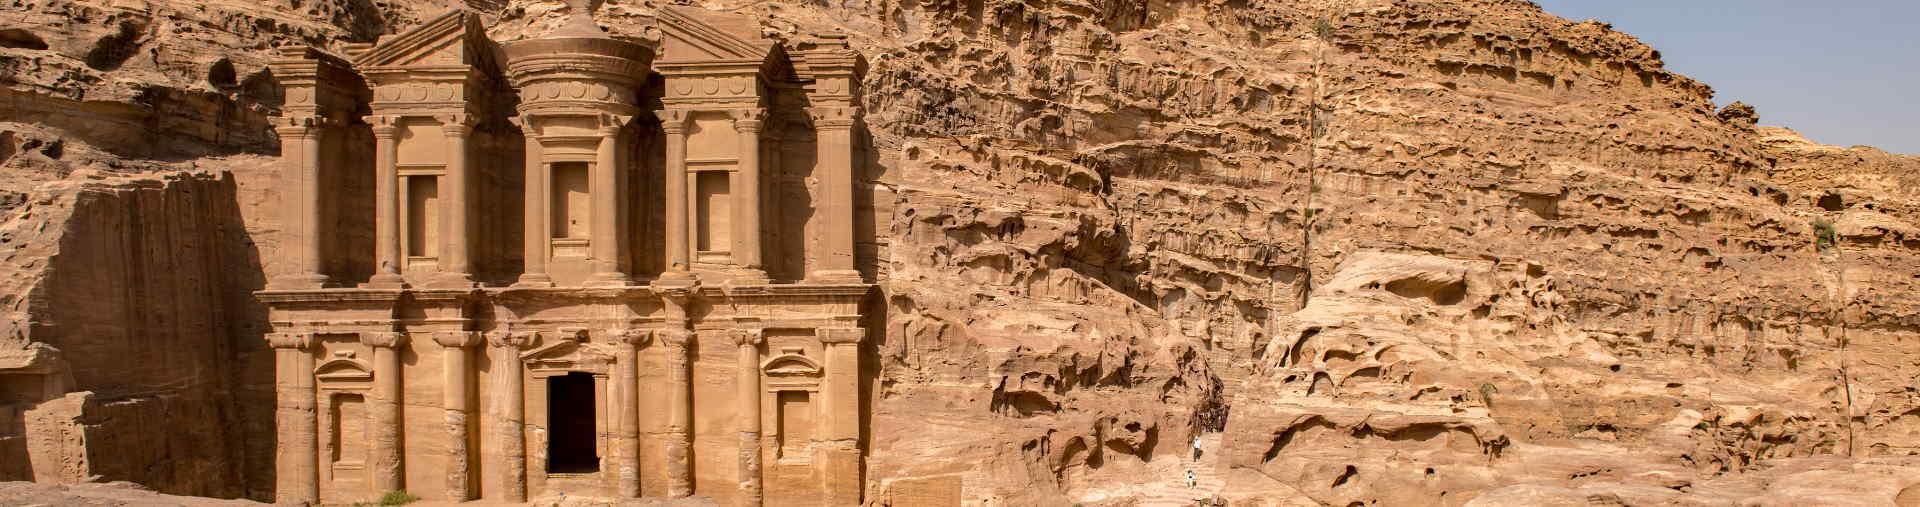 Petra Tour from eilat